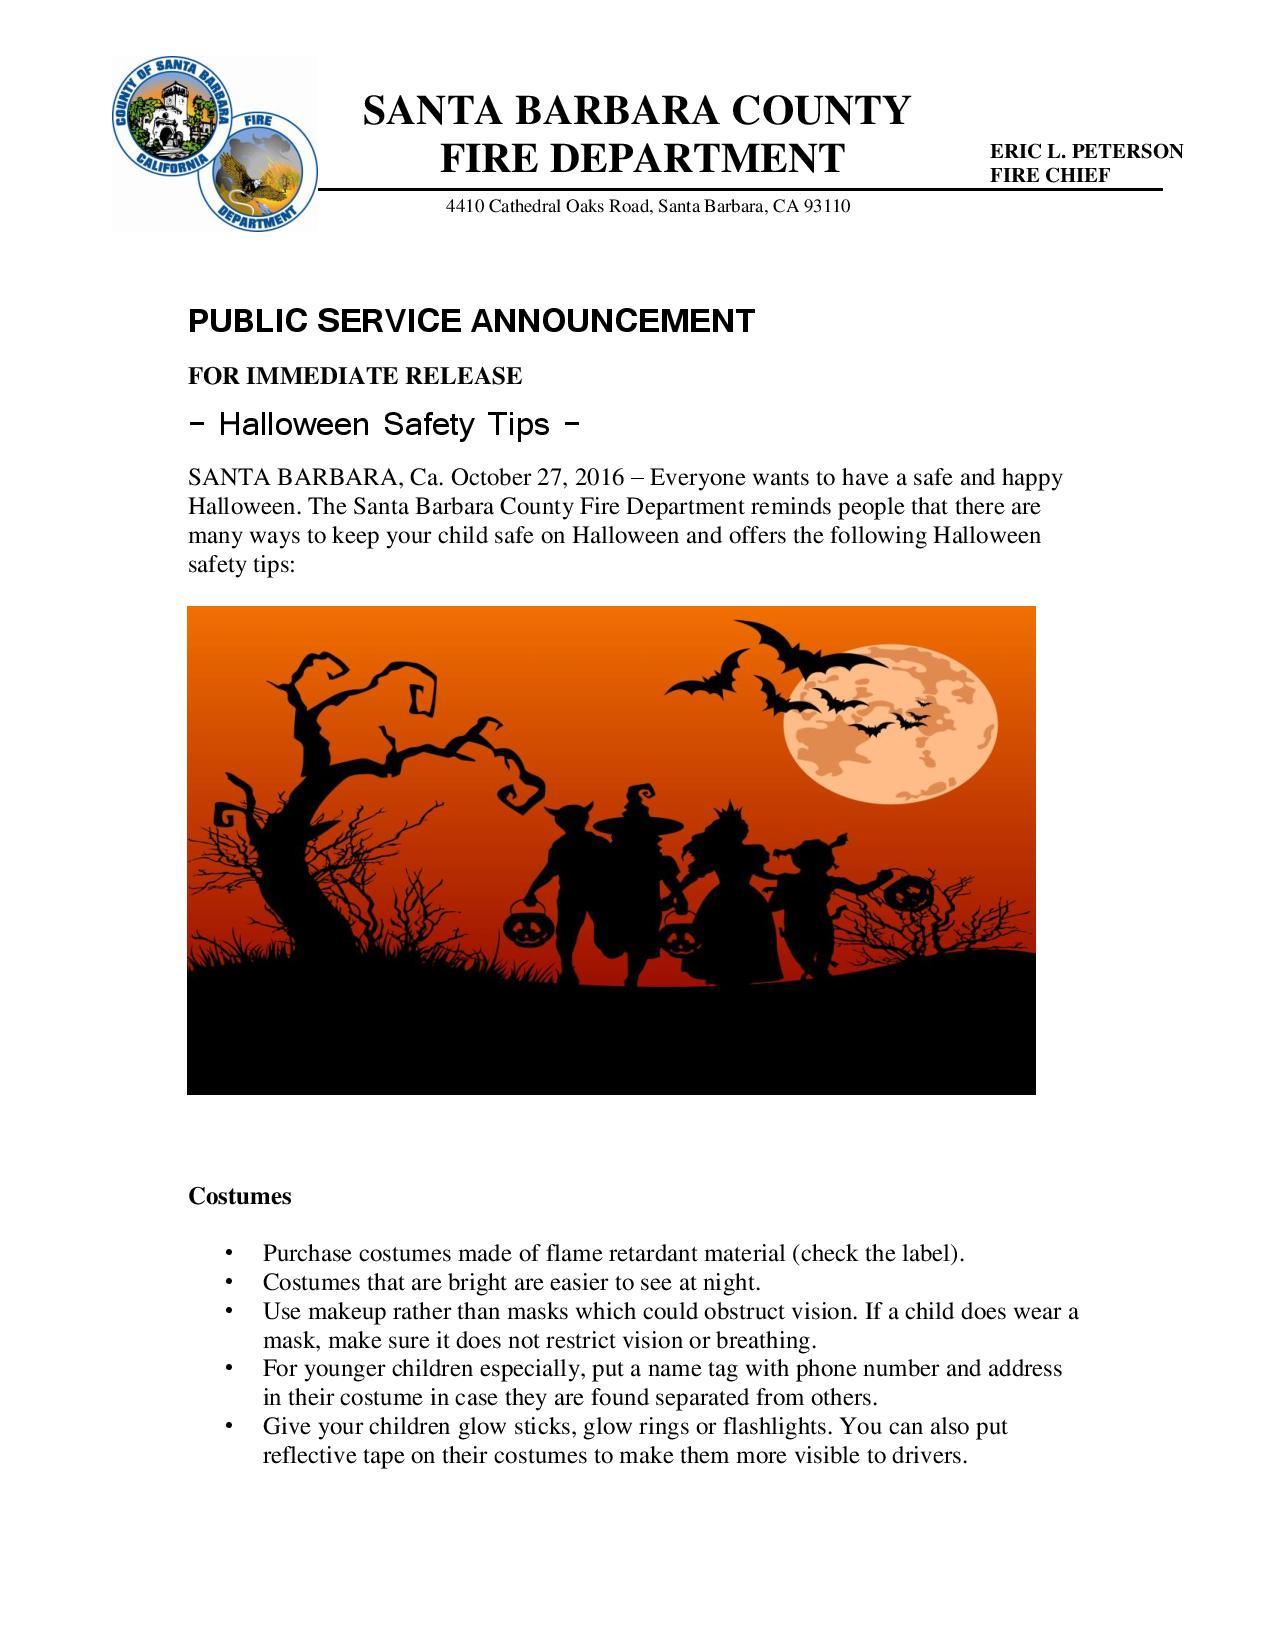 PSA Halloween Safety-pg1